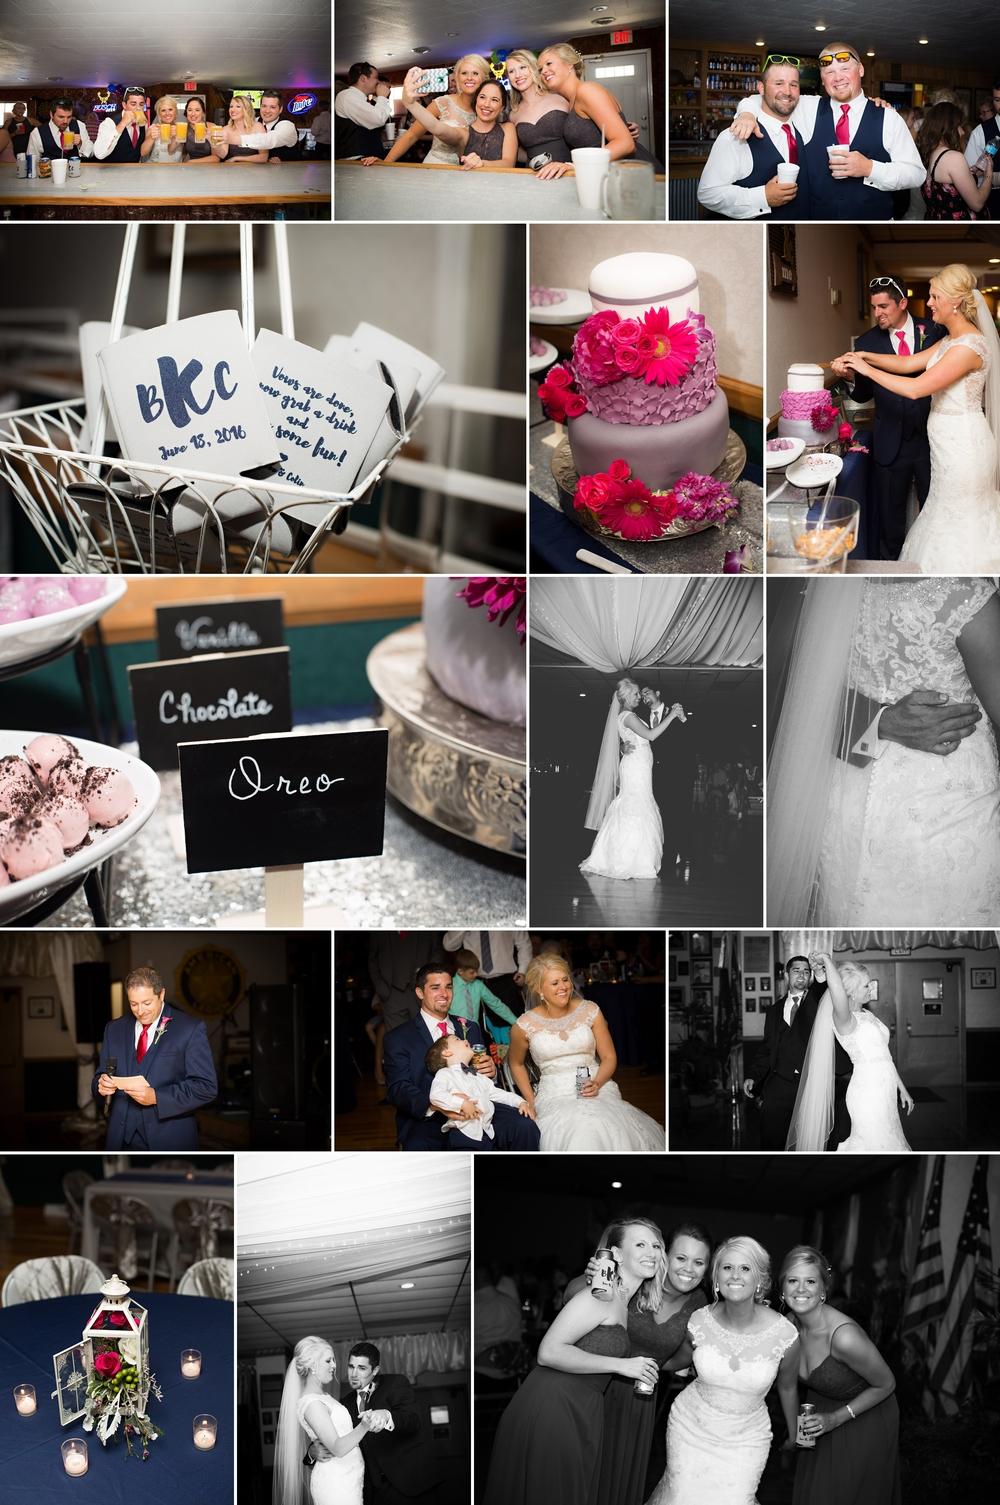 Kuhn wedding 6.jpg